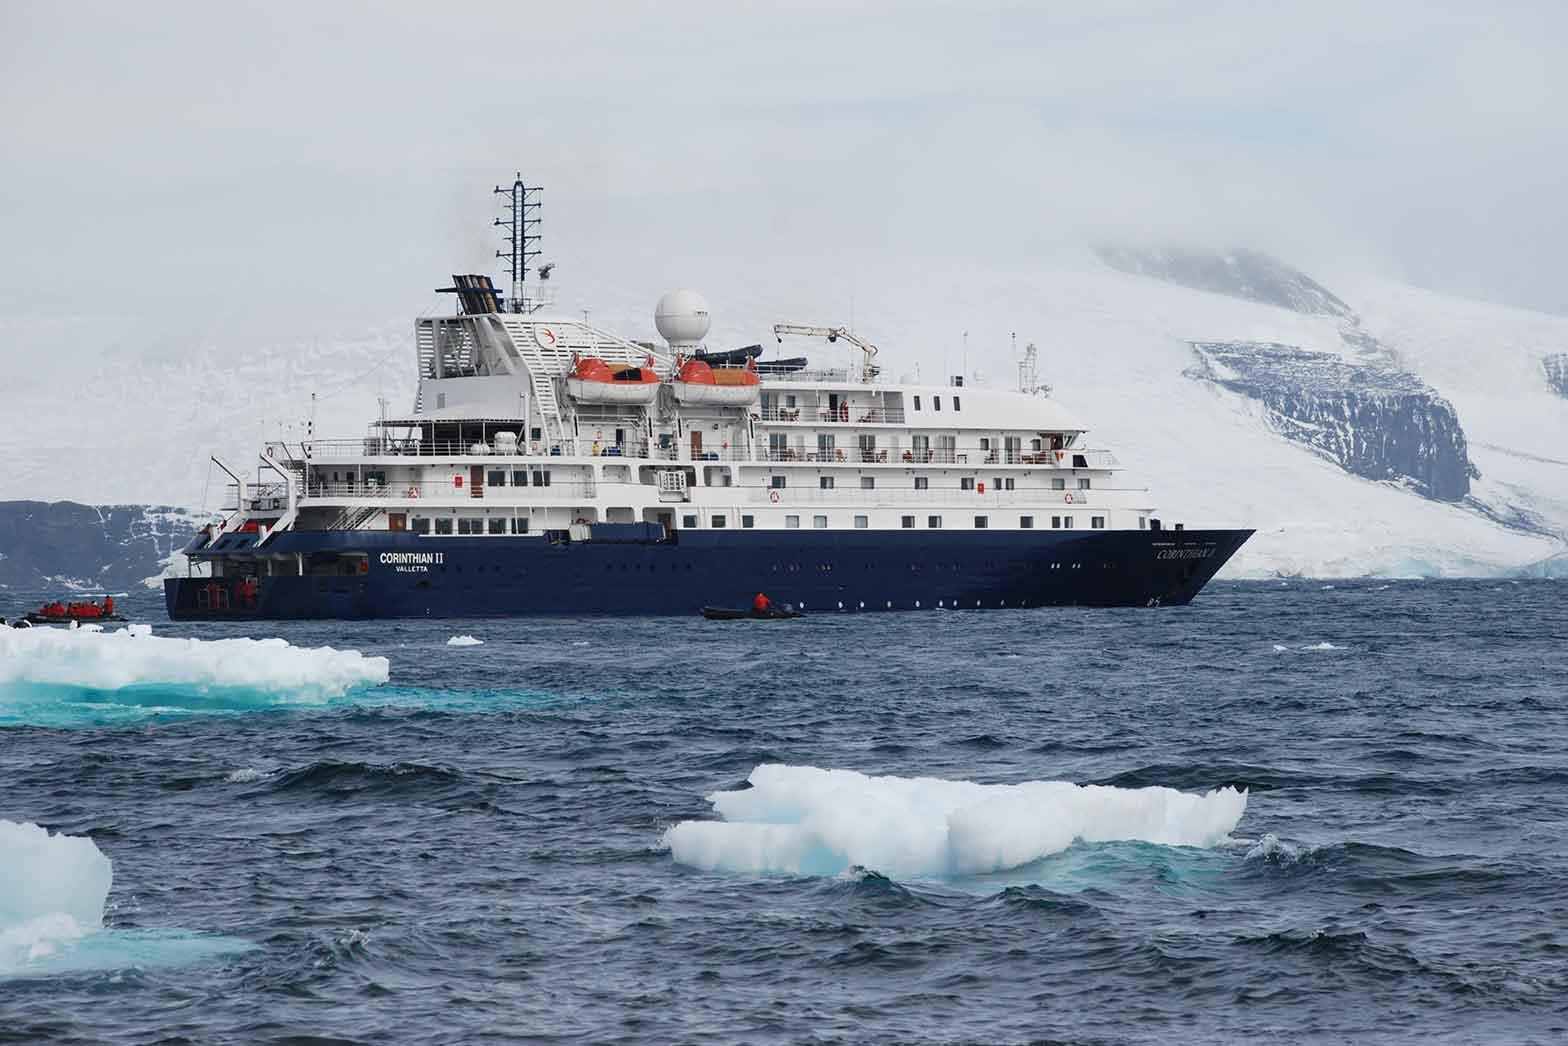 Cruise vessel